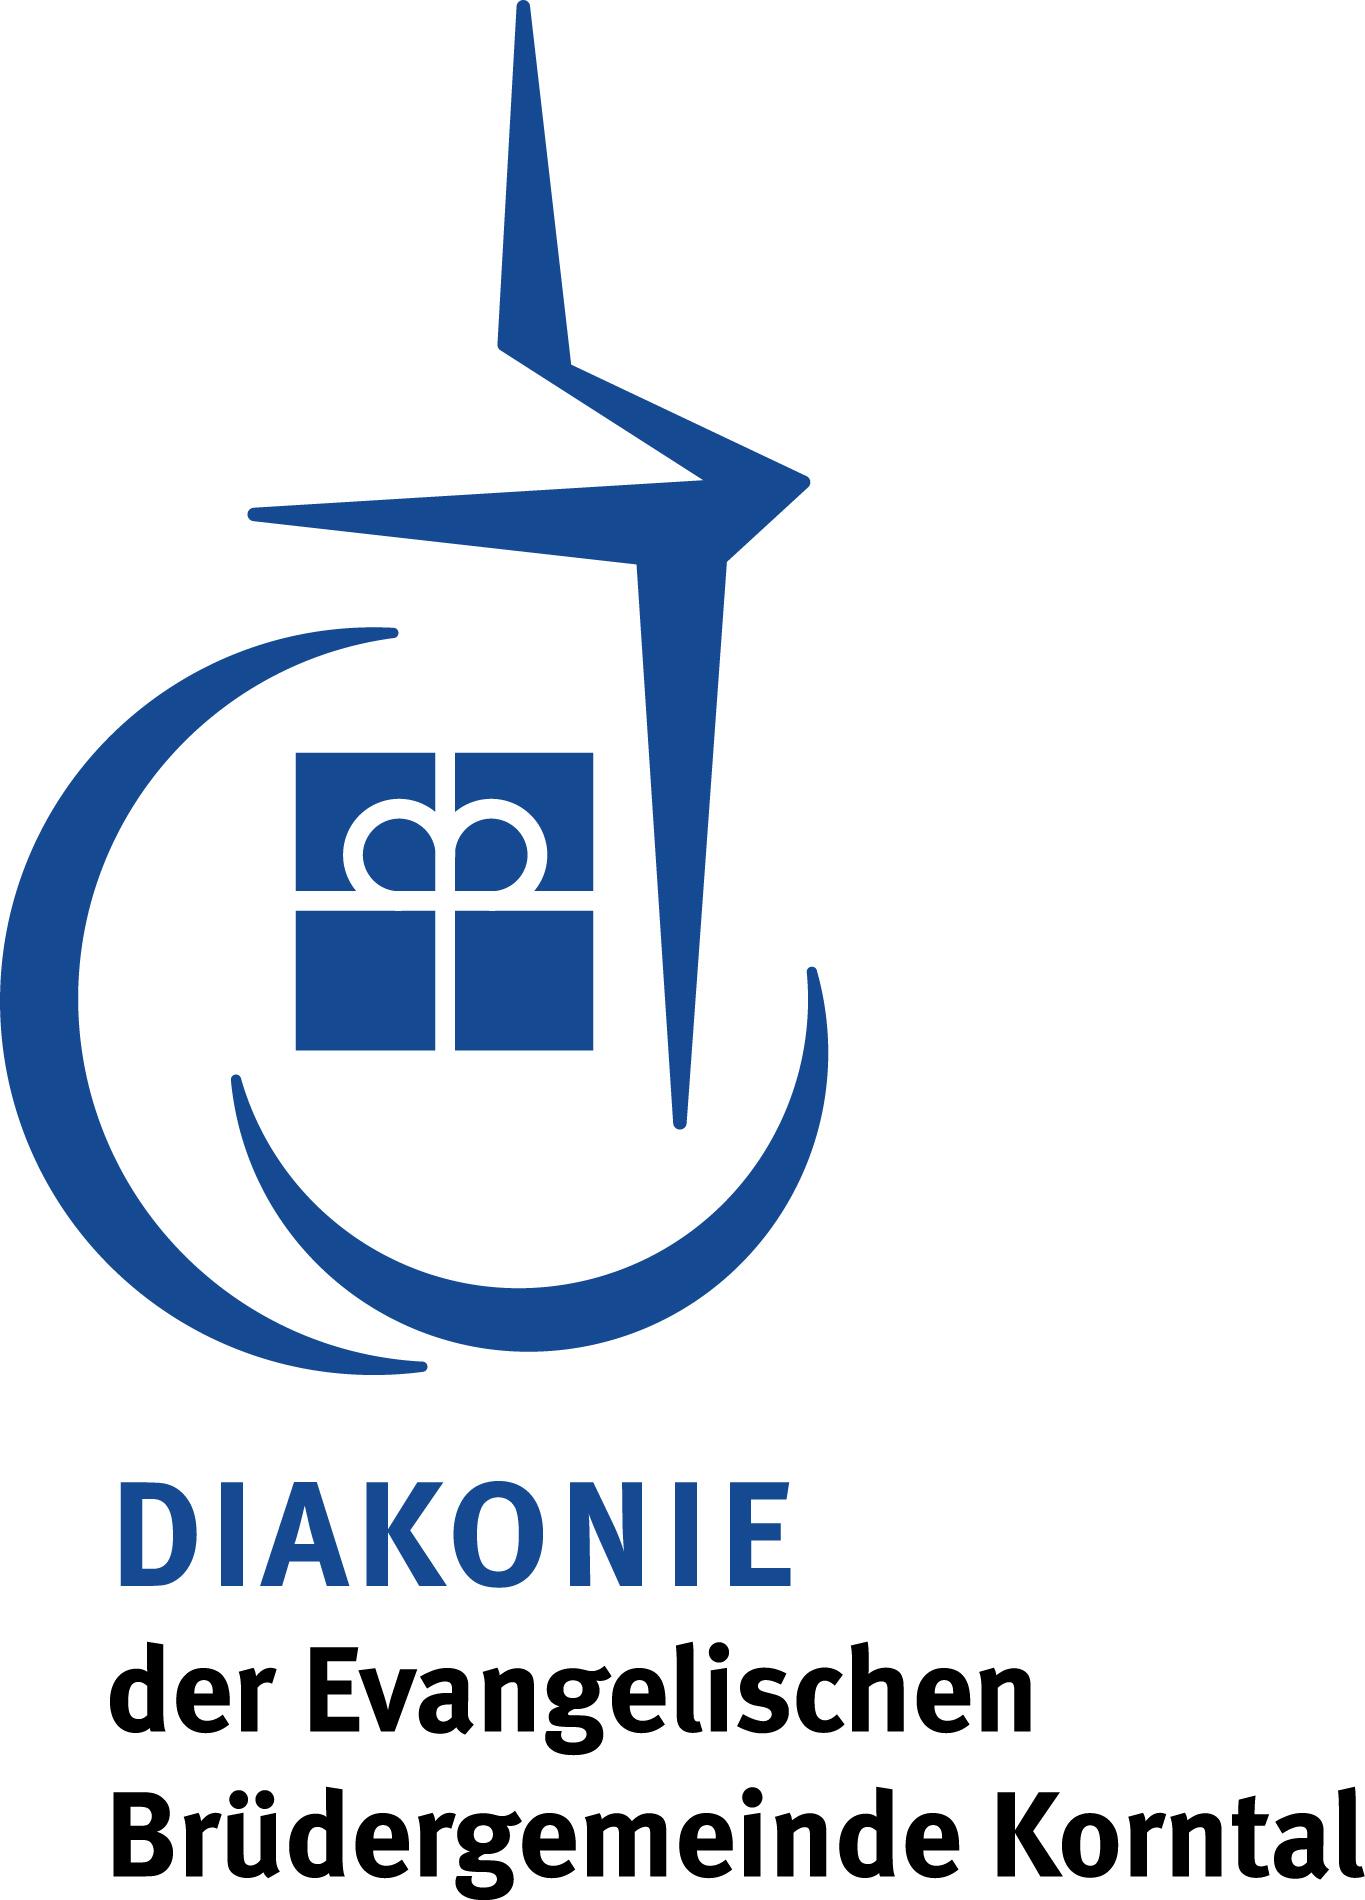 Logo: Diakonie der Ev. Brüdergemeinde Korntal - Jugendhilfe Korntal teilstationär/ambulant